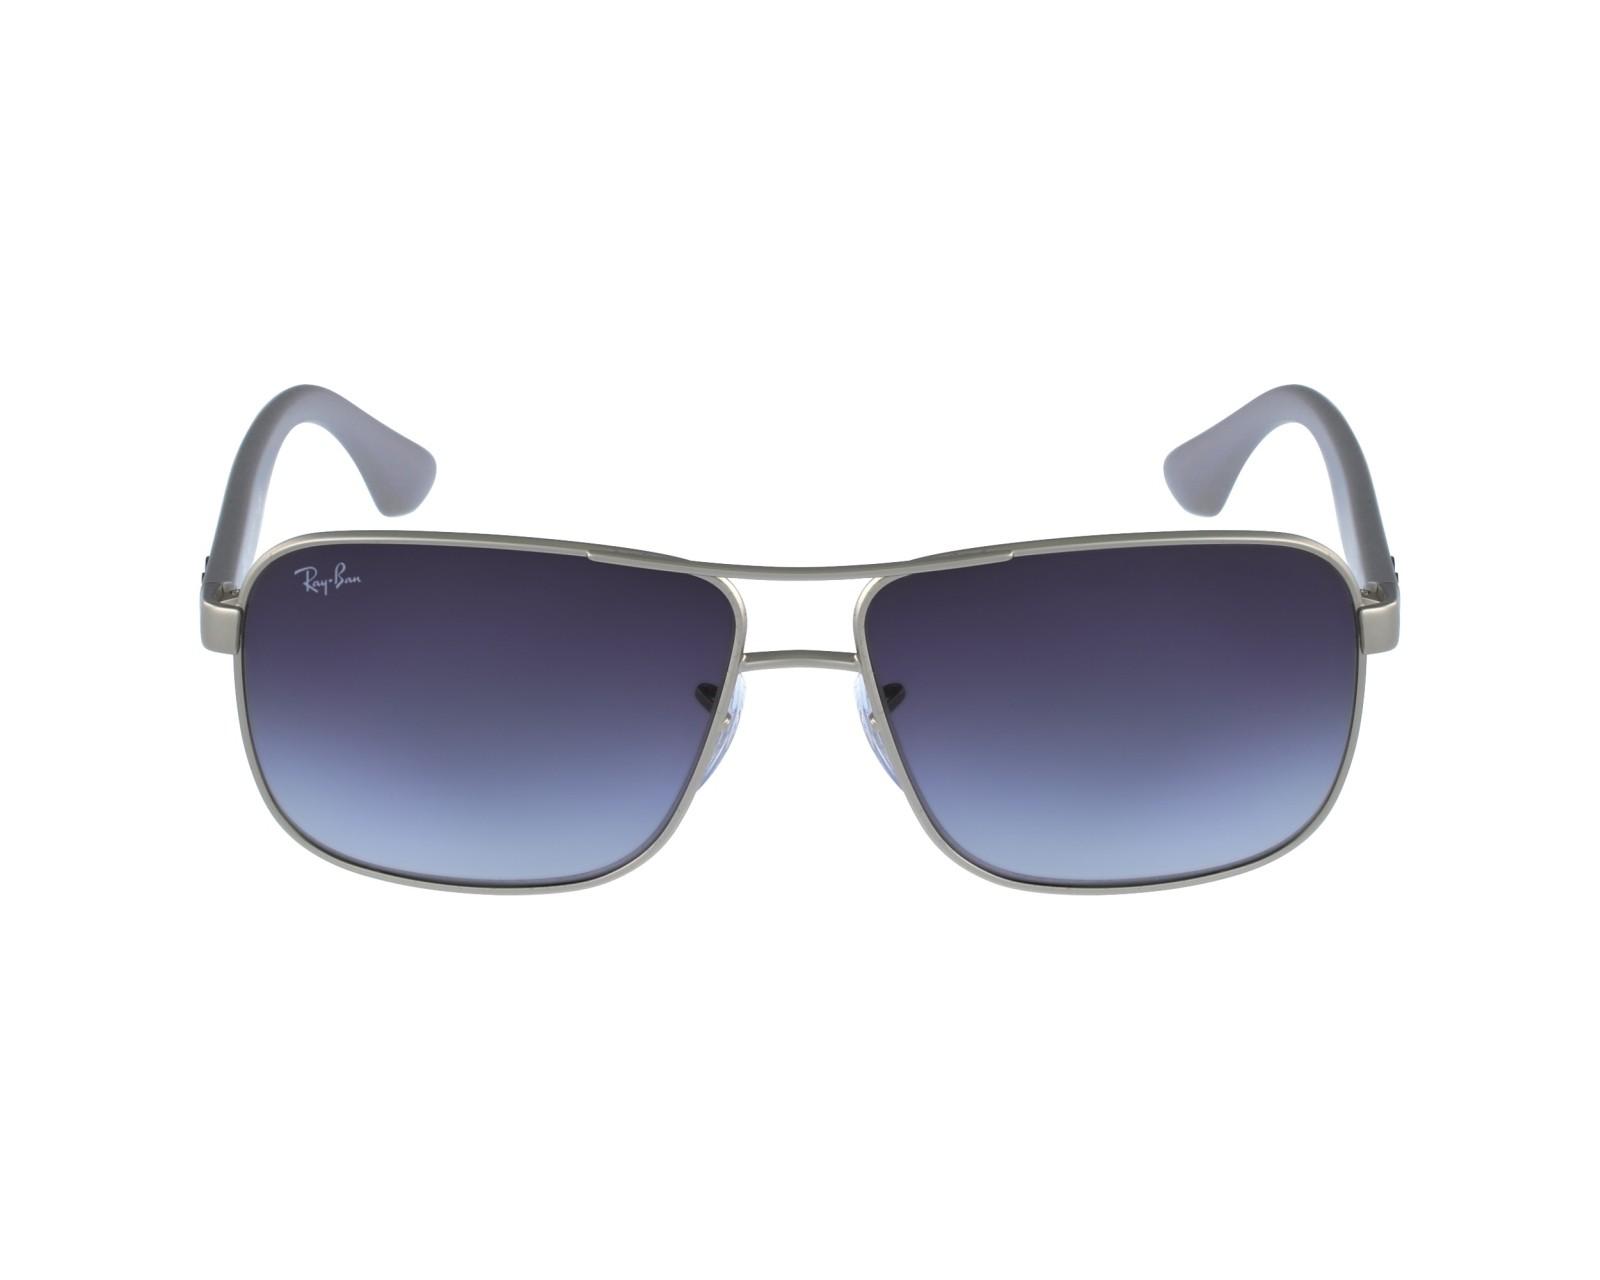 3746cbd3b1e thumbnail Sunglasses Ray-Ban RB-3516 019 8G - Silver Grey profile view